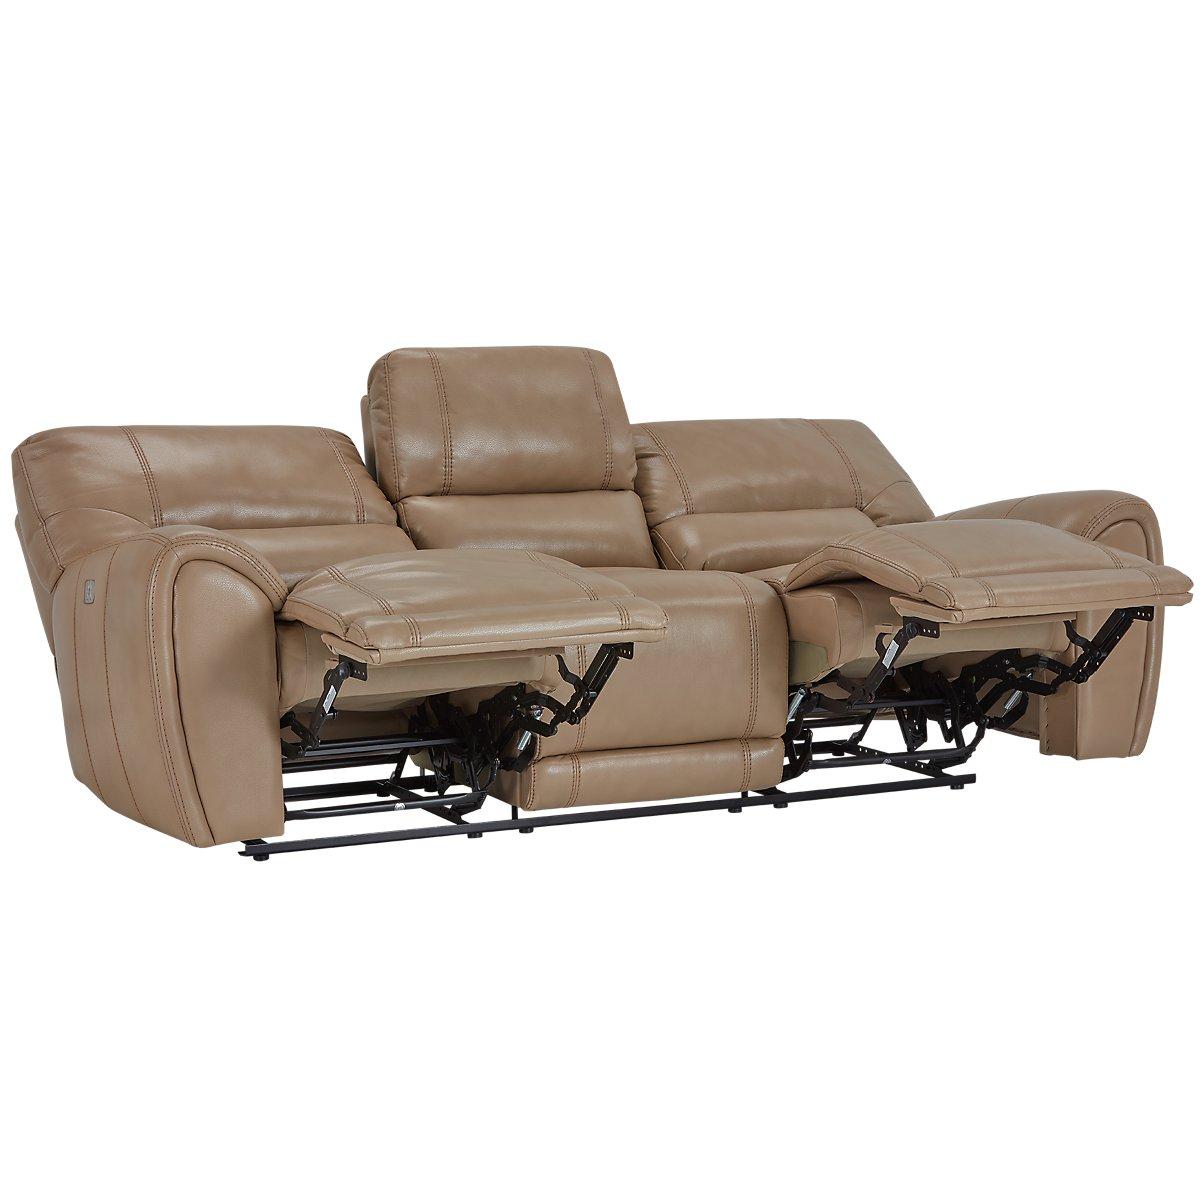 Bailey Taupe Microfiber Power Reclining Sofa